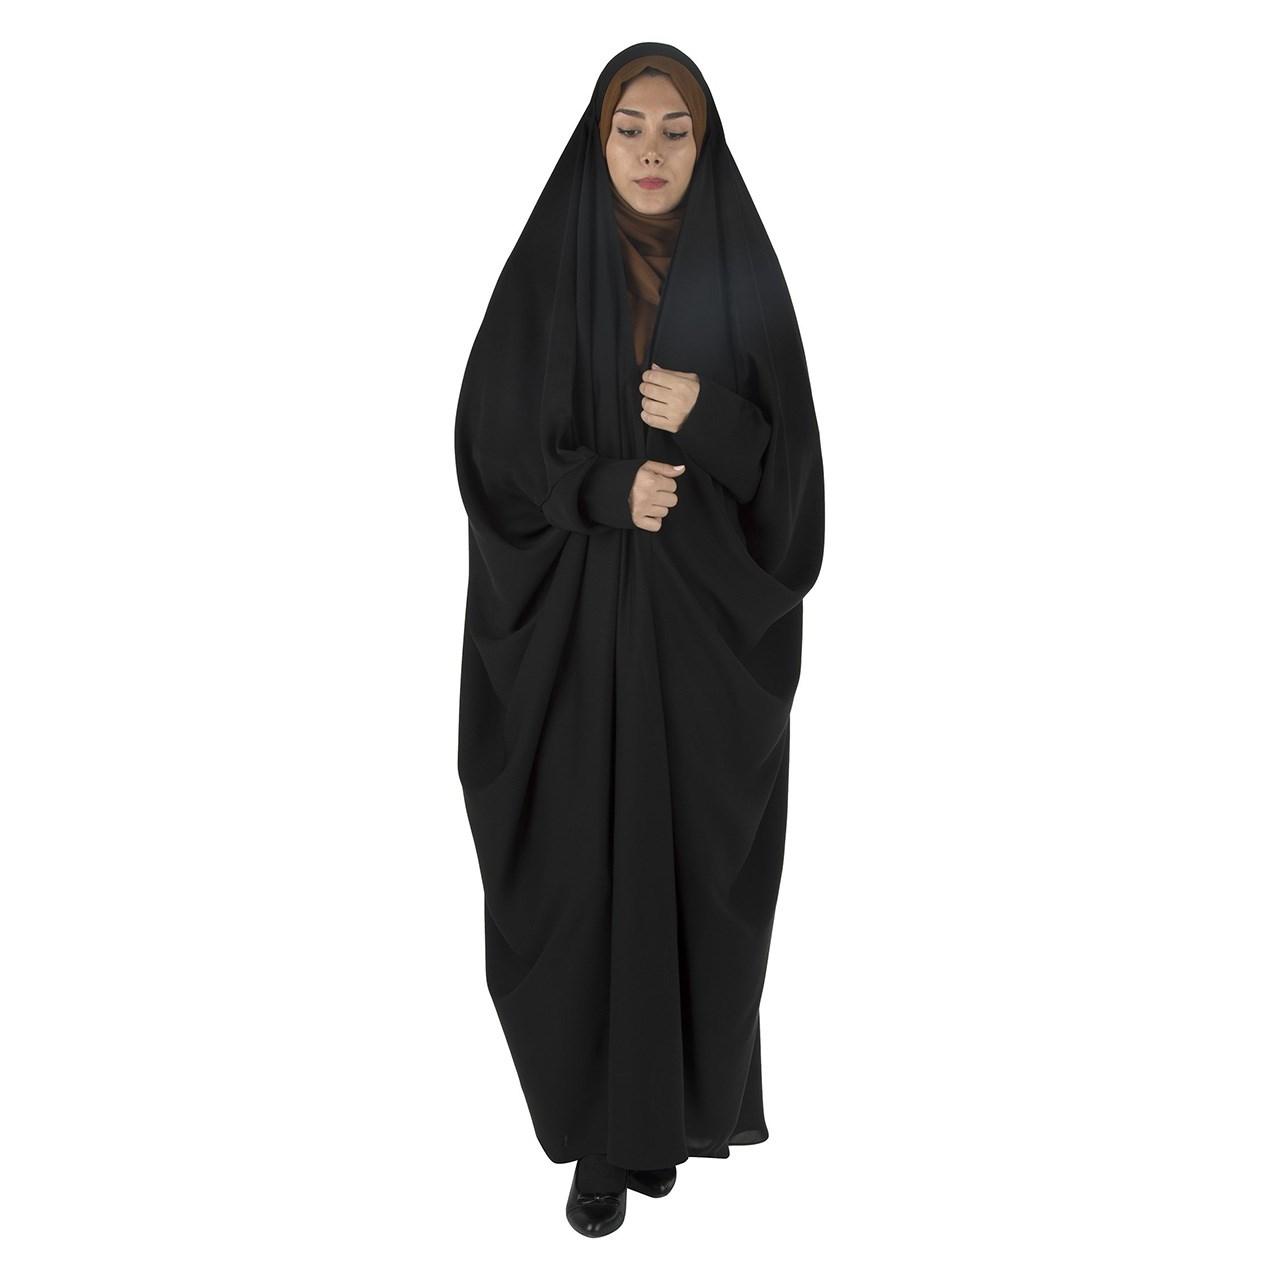 چادر زنانه اسلامی تکستیل مدل 8005